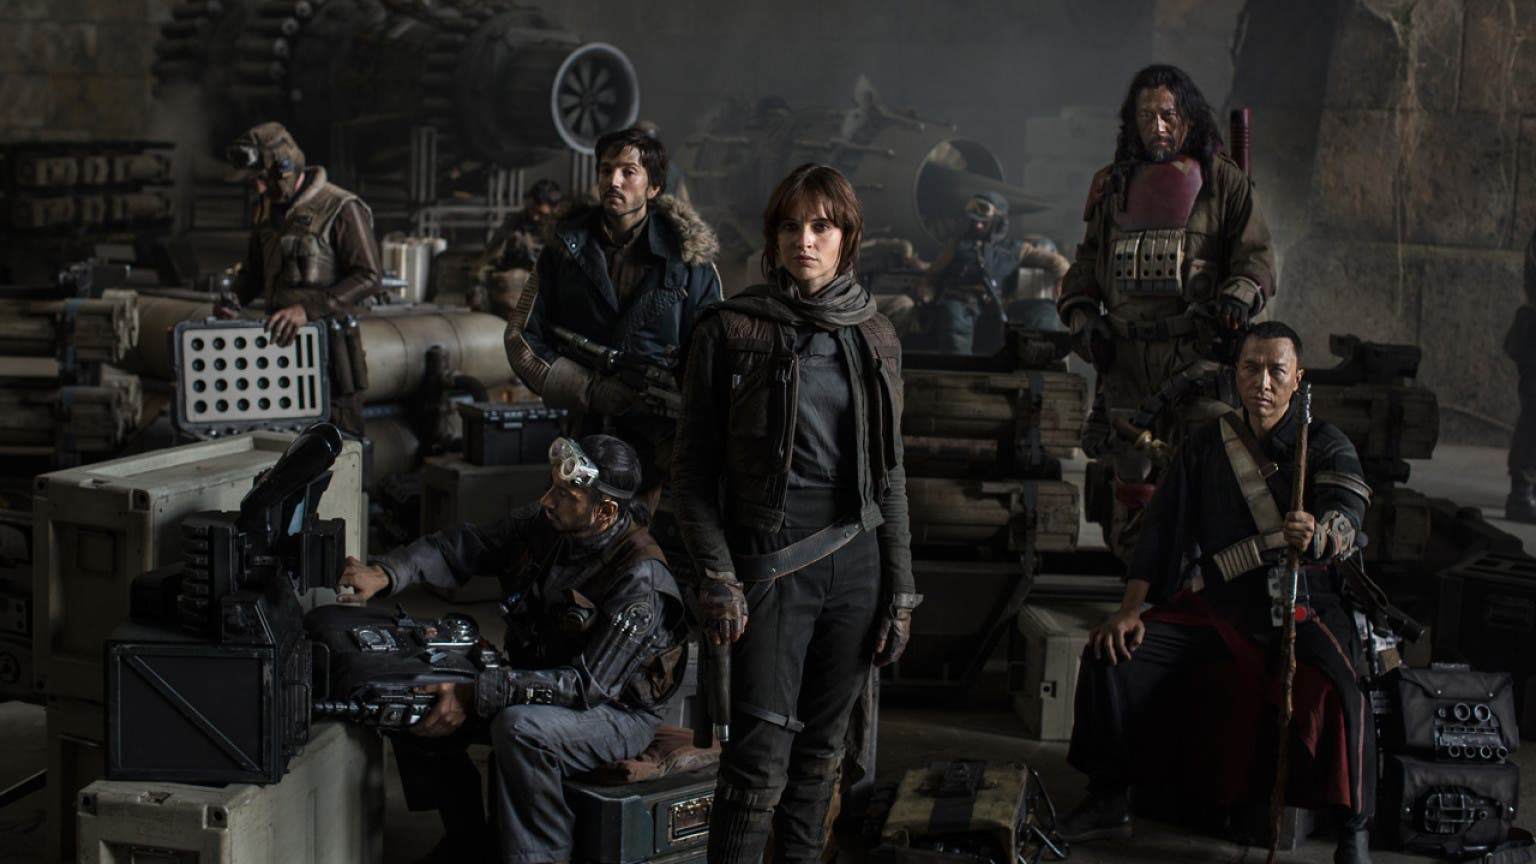 Areajugones Star Wars Rogue One